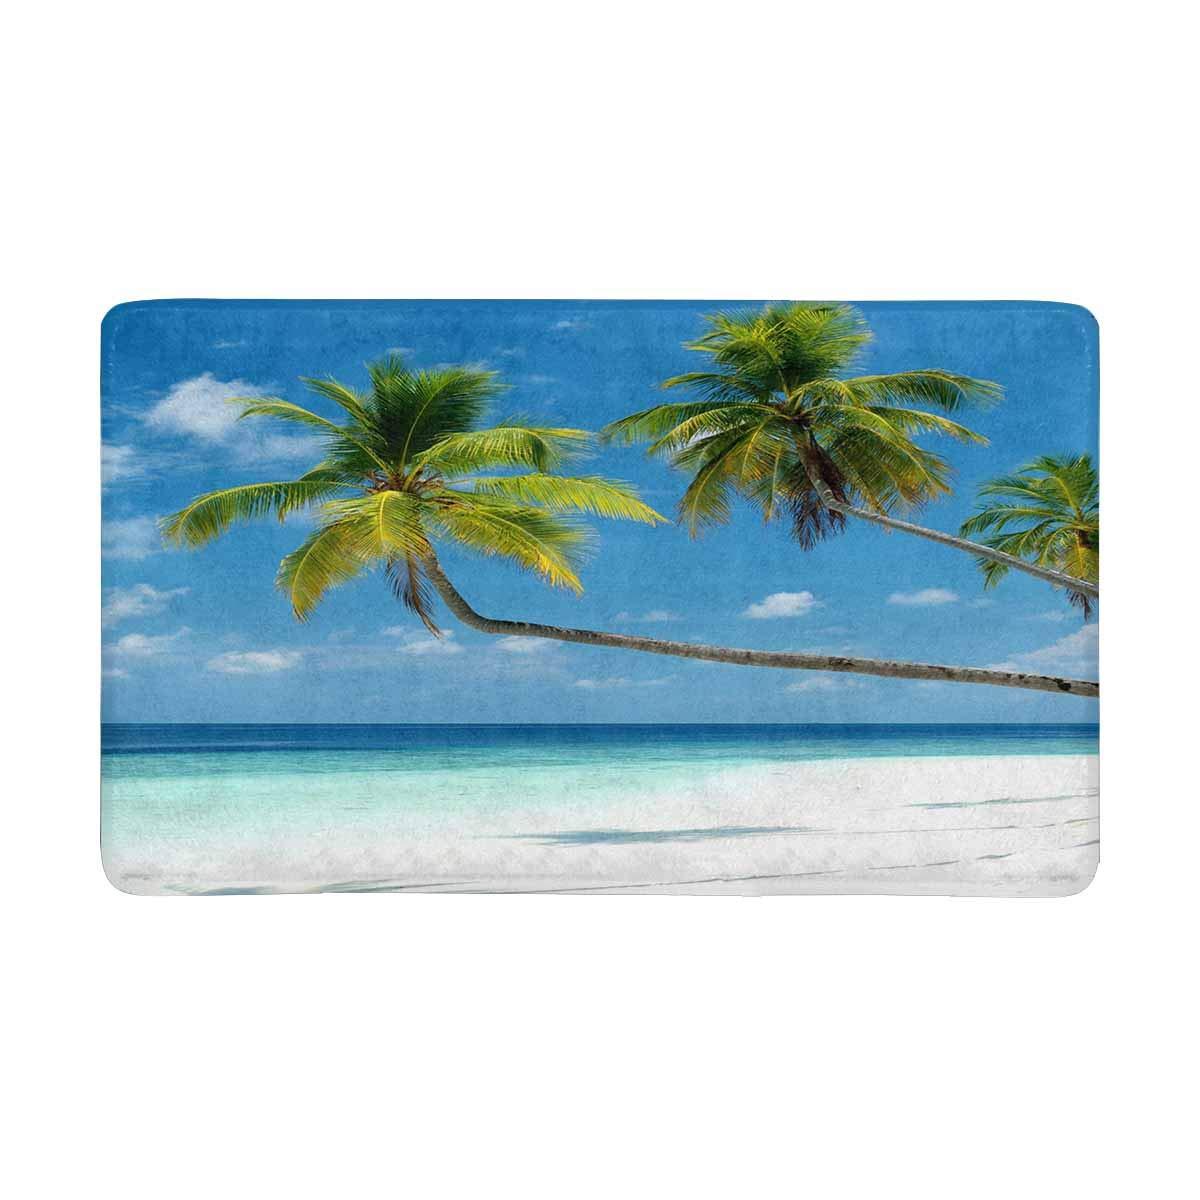 Summer Tropical Beach Ocean With Palm Tree Doormat Anti